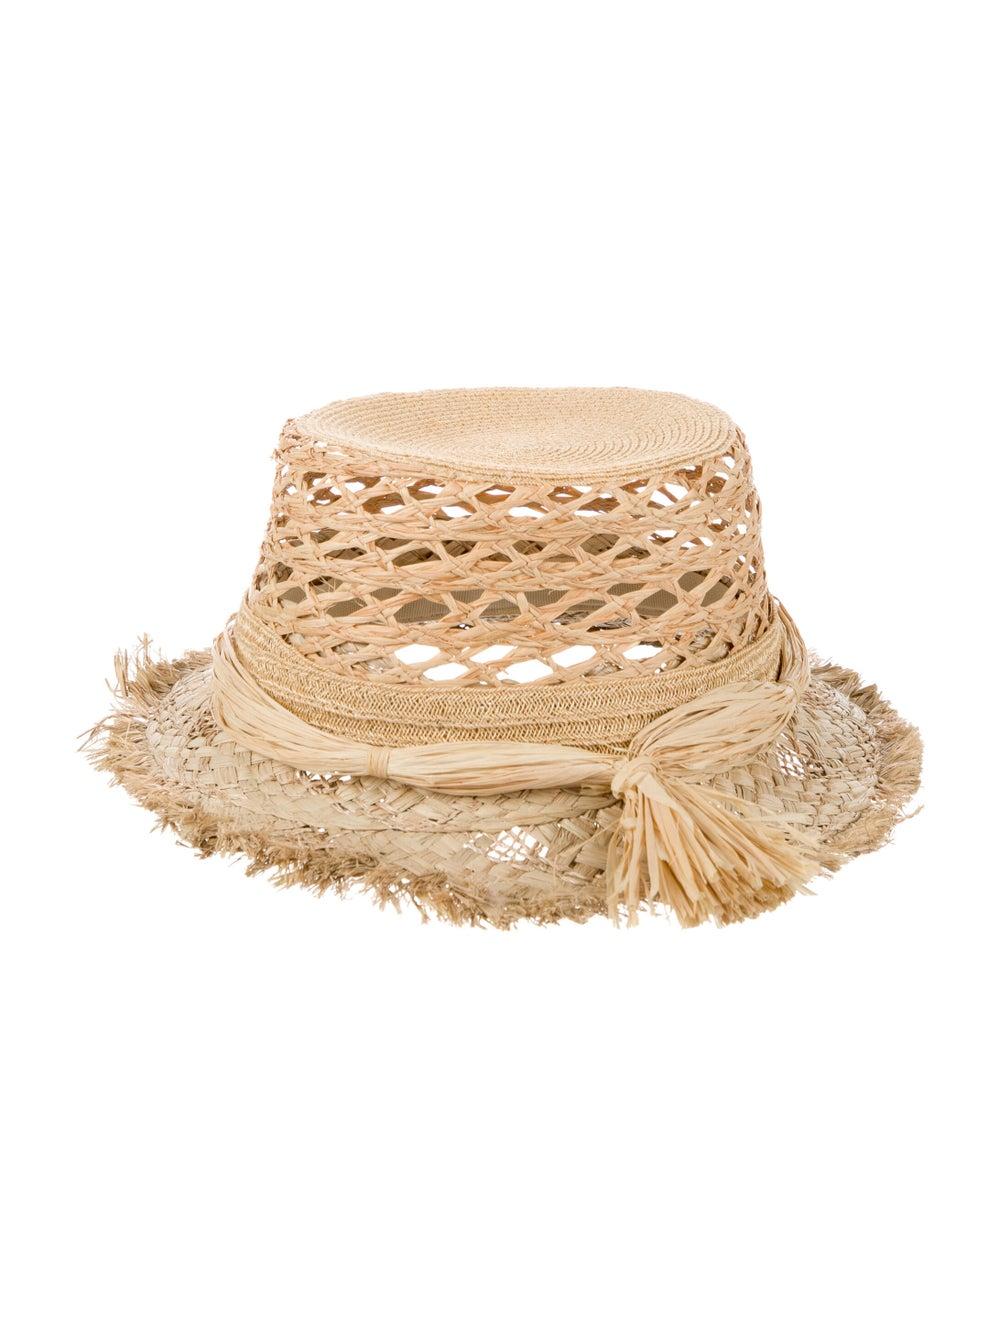 Christian Dior Jardin Raffia Hat Tan - image 2